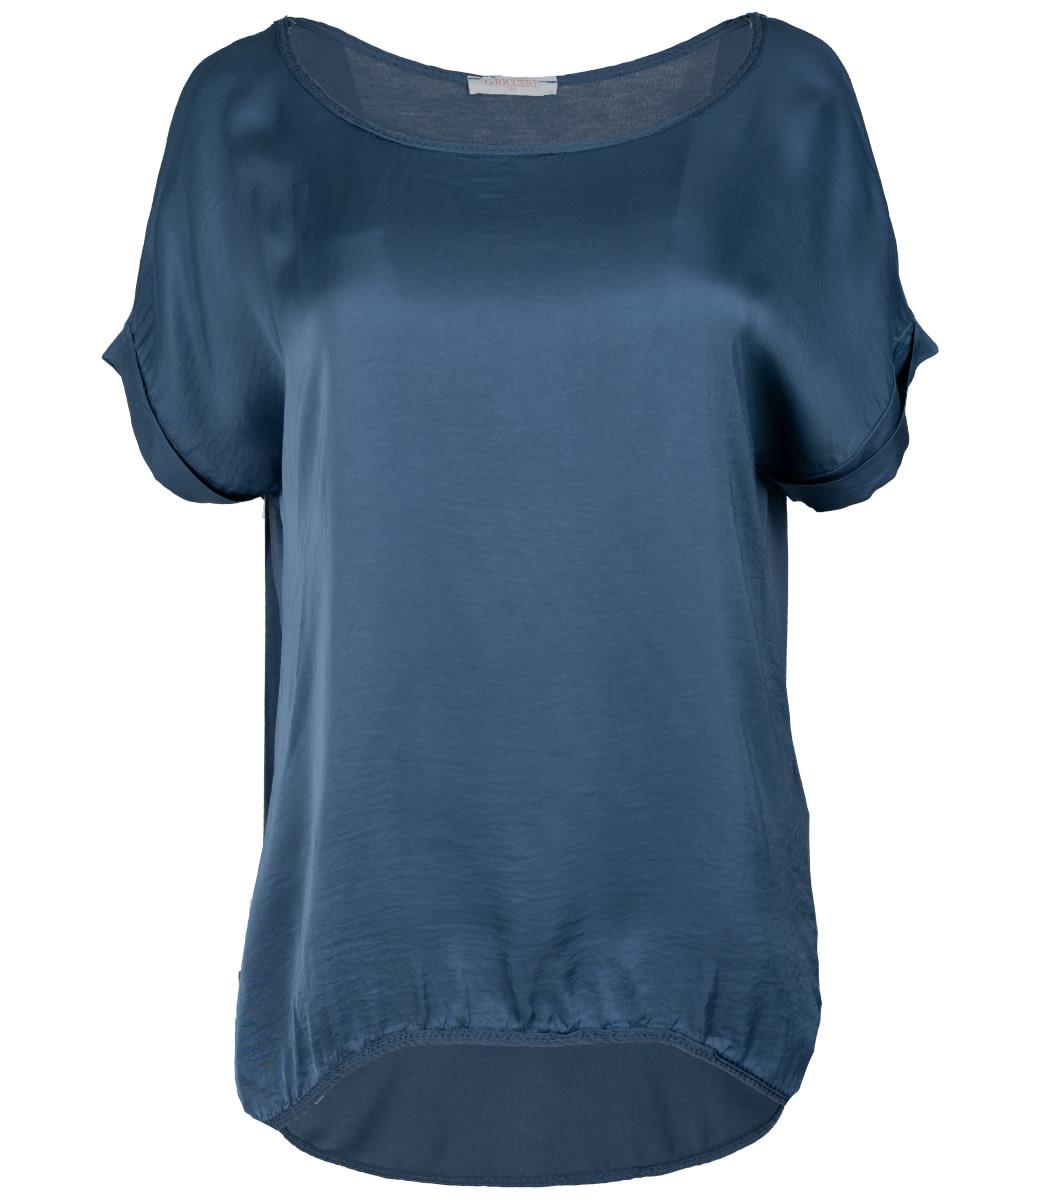 Gemma Ricceri Shirt jeansblauw silk touch